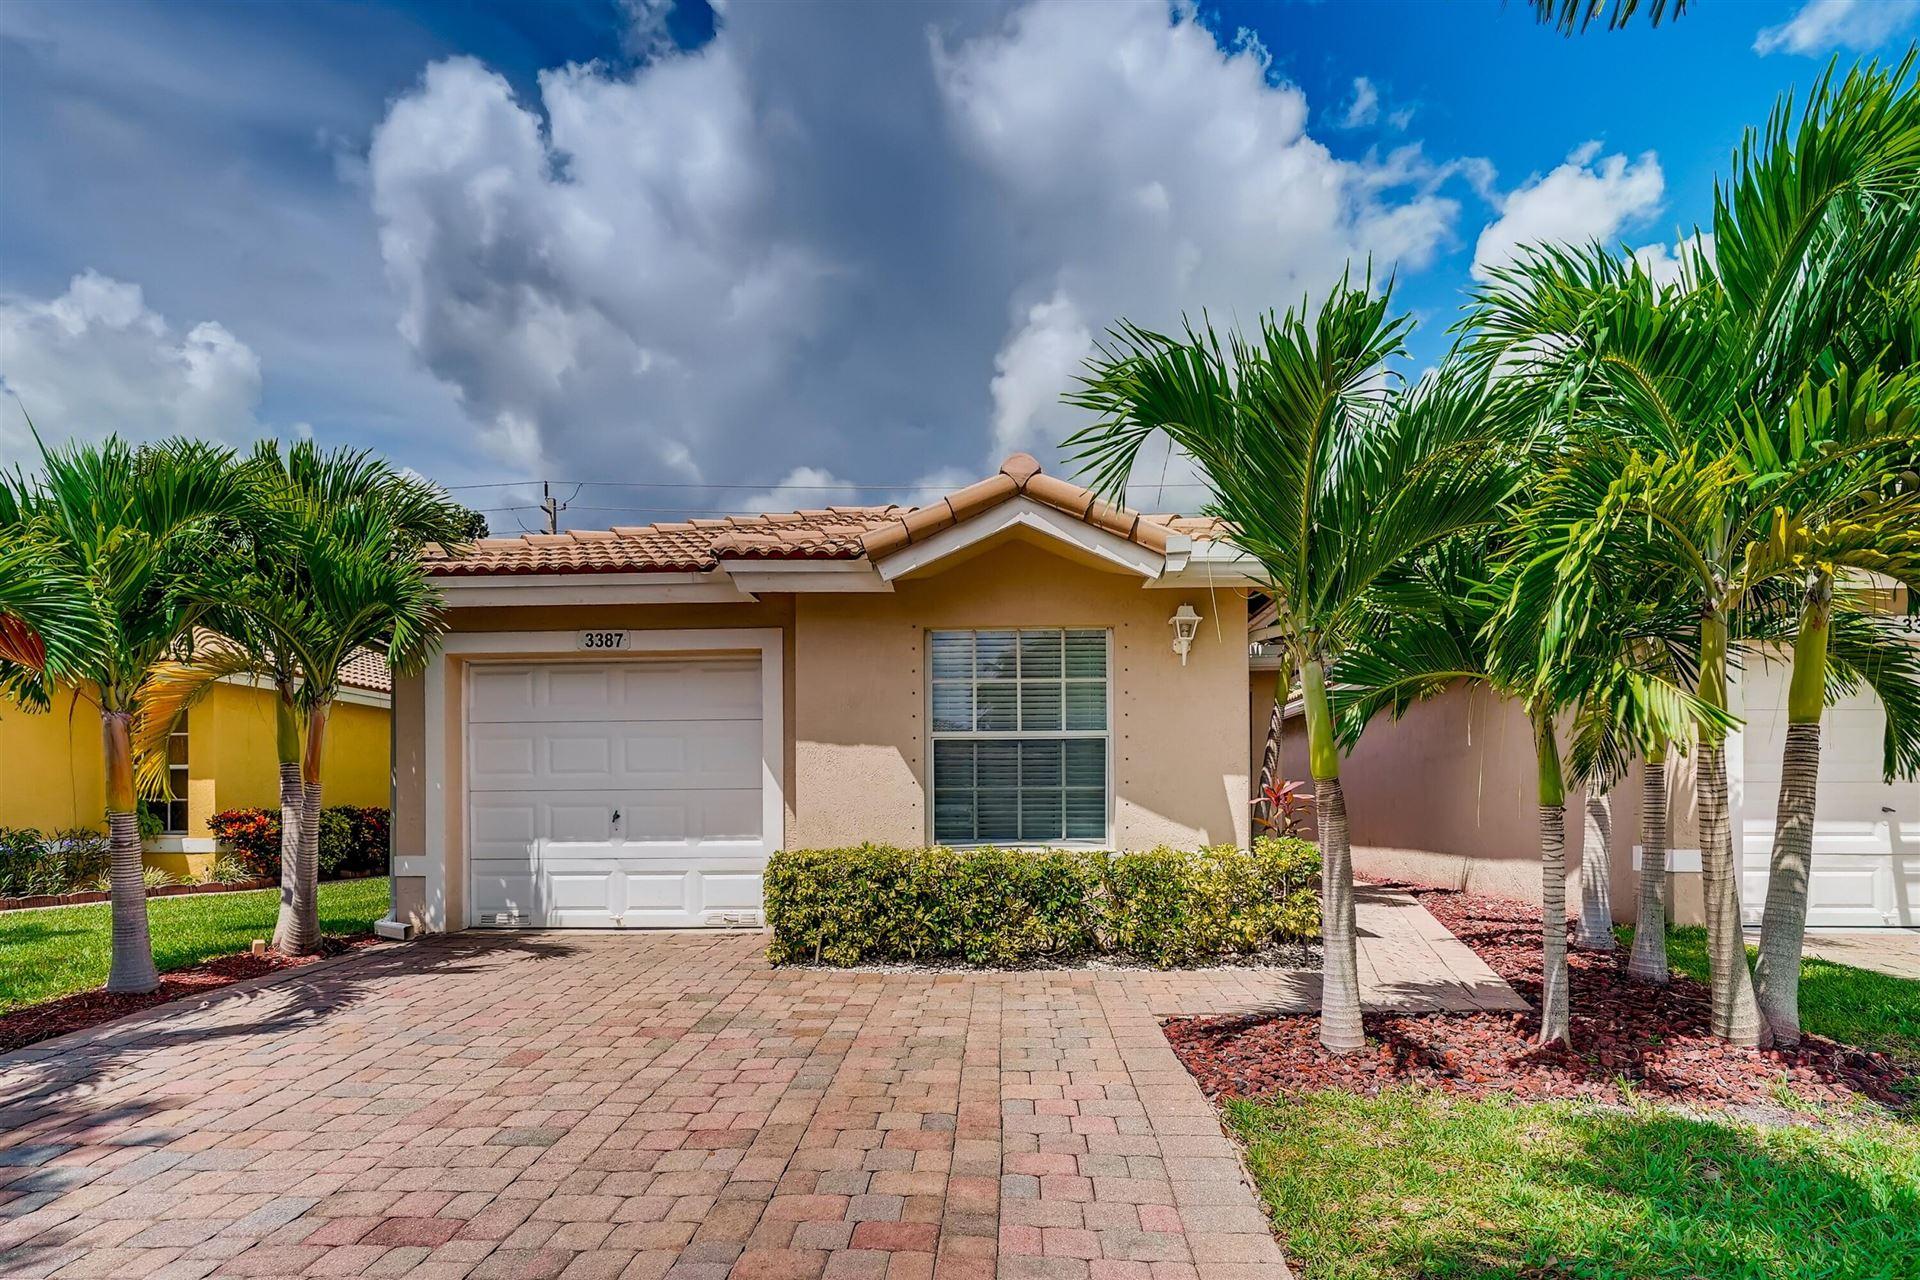 3387 Commodore Court, West Palm Beach, FL 33411 - MLS#: RX-10745750